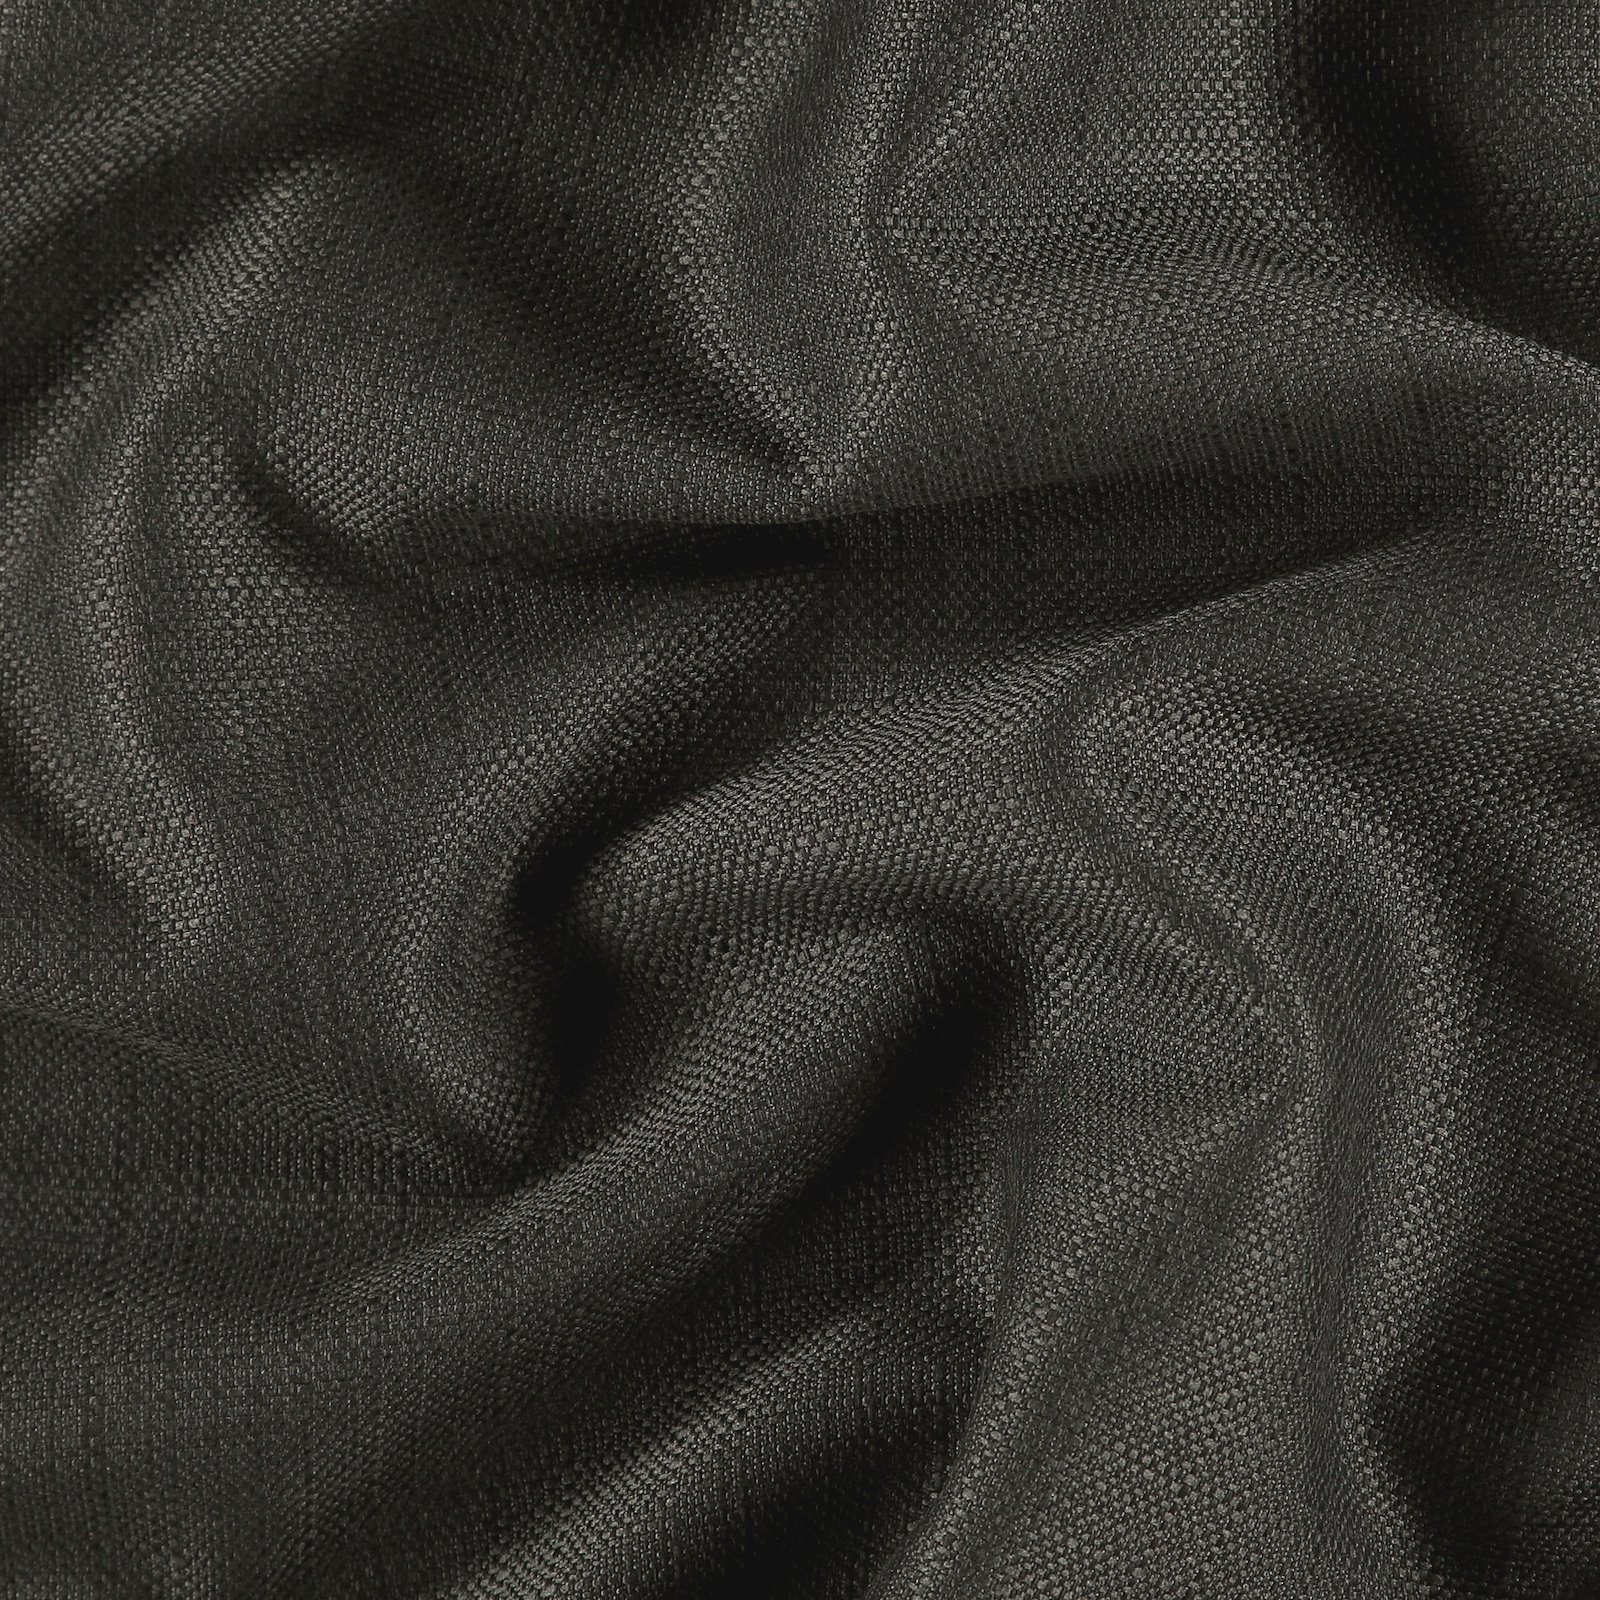 Upholstery fabric khaki